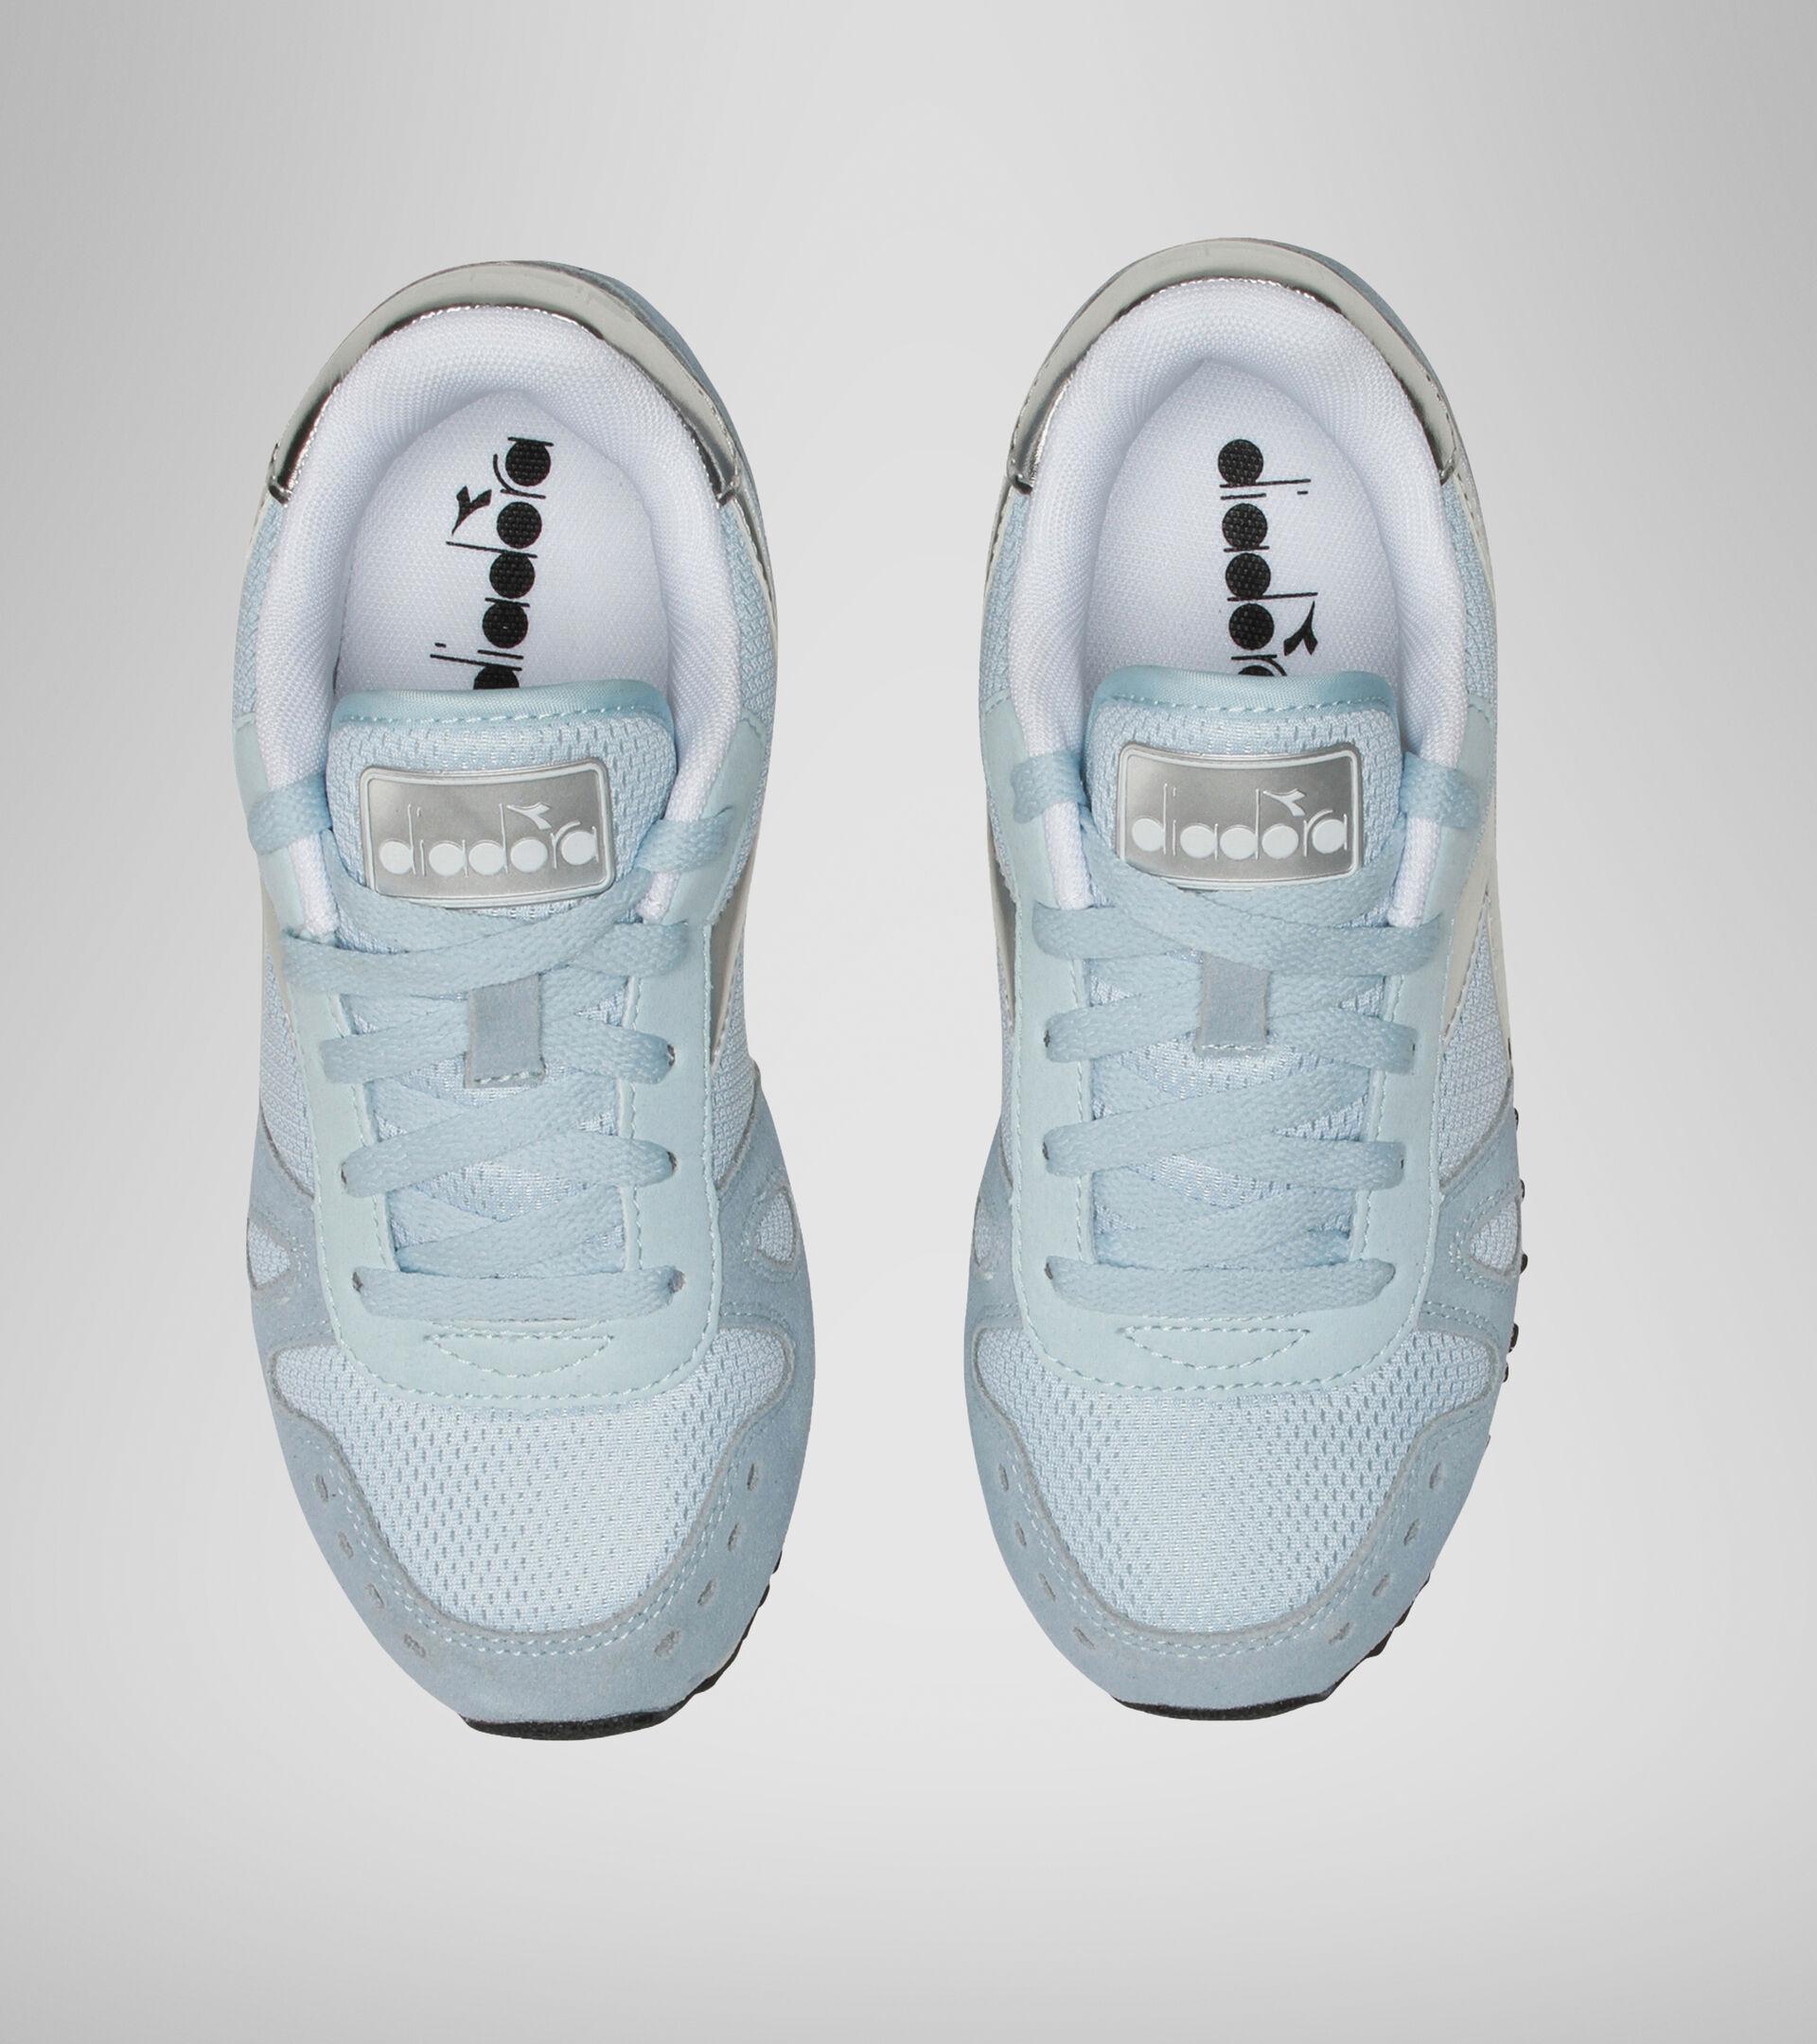 Footwear Sport BAMBINO SIMPLE RUN GS GIRL AZUL LUZ DE LA ESTRELLAS Diadora